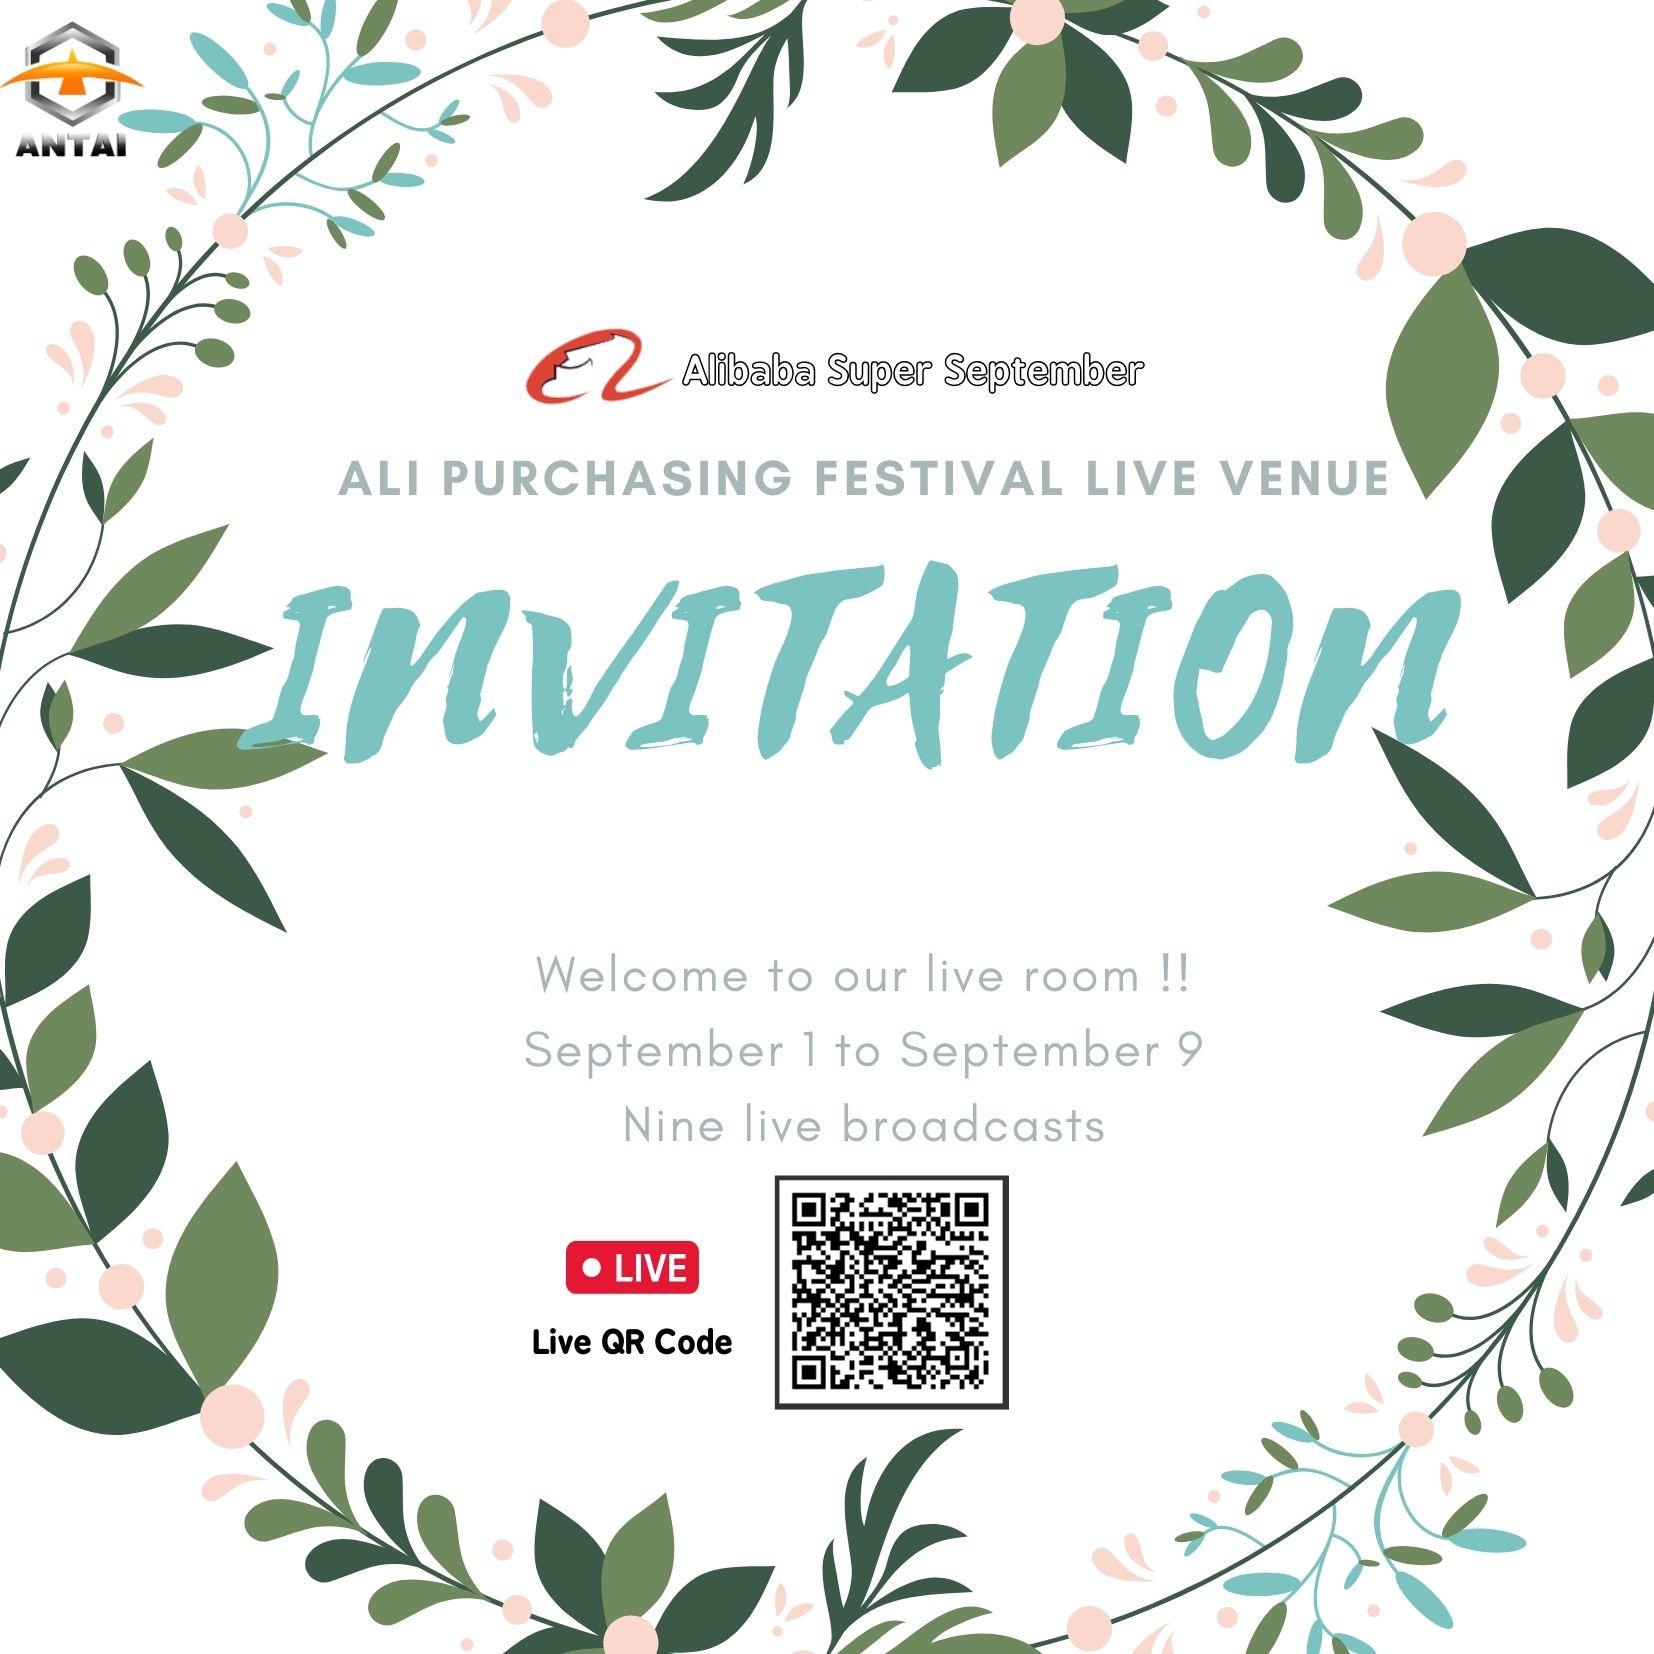 210826 INVITATION LETTER 001